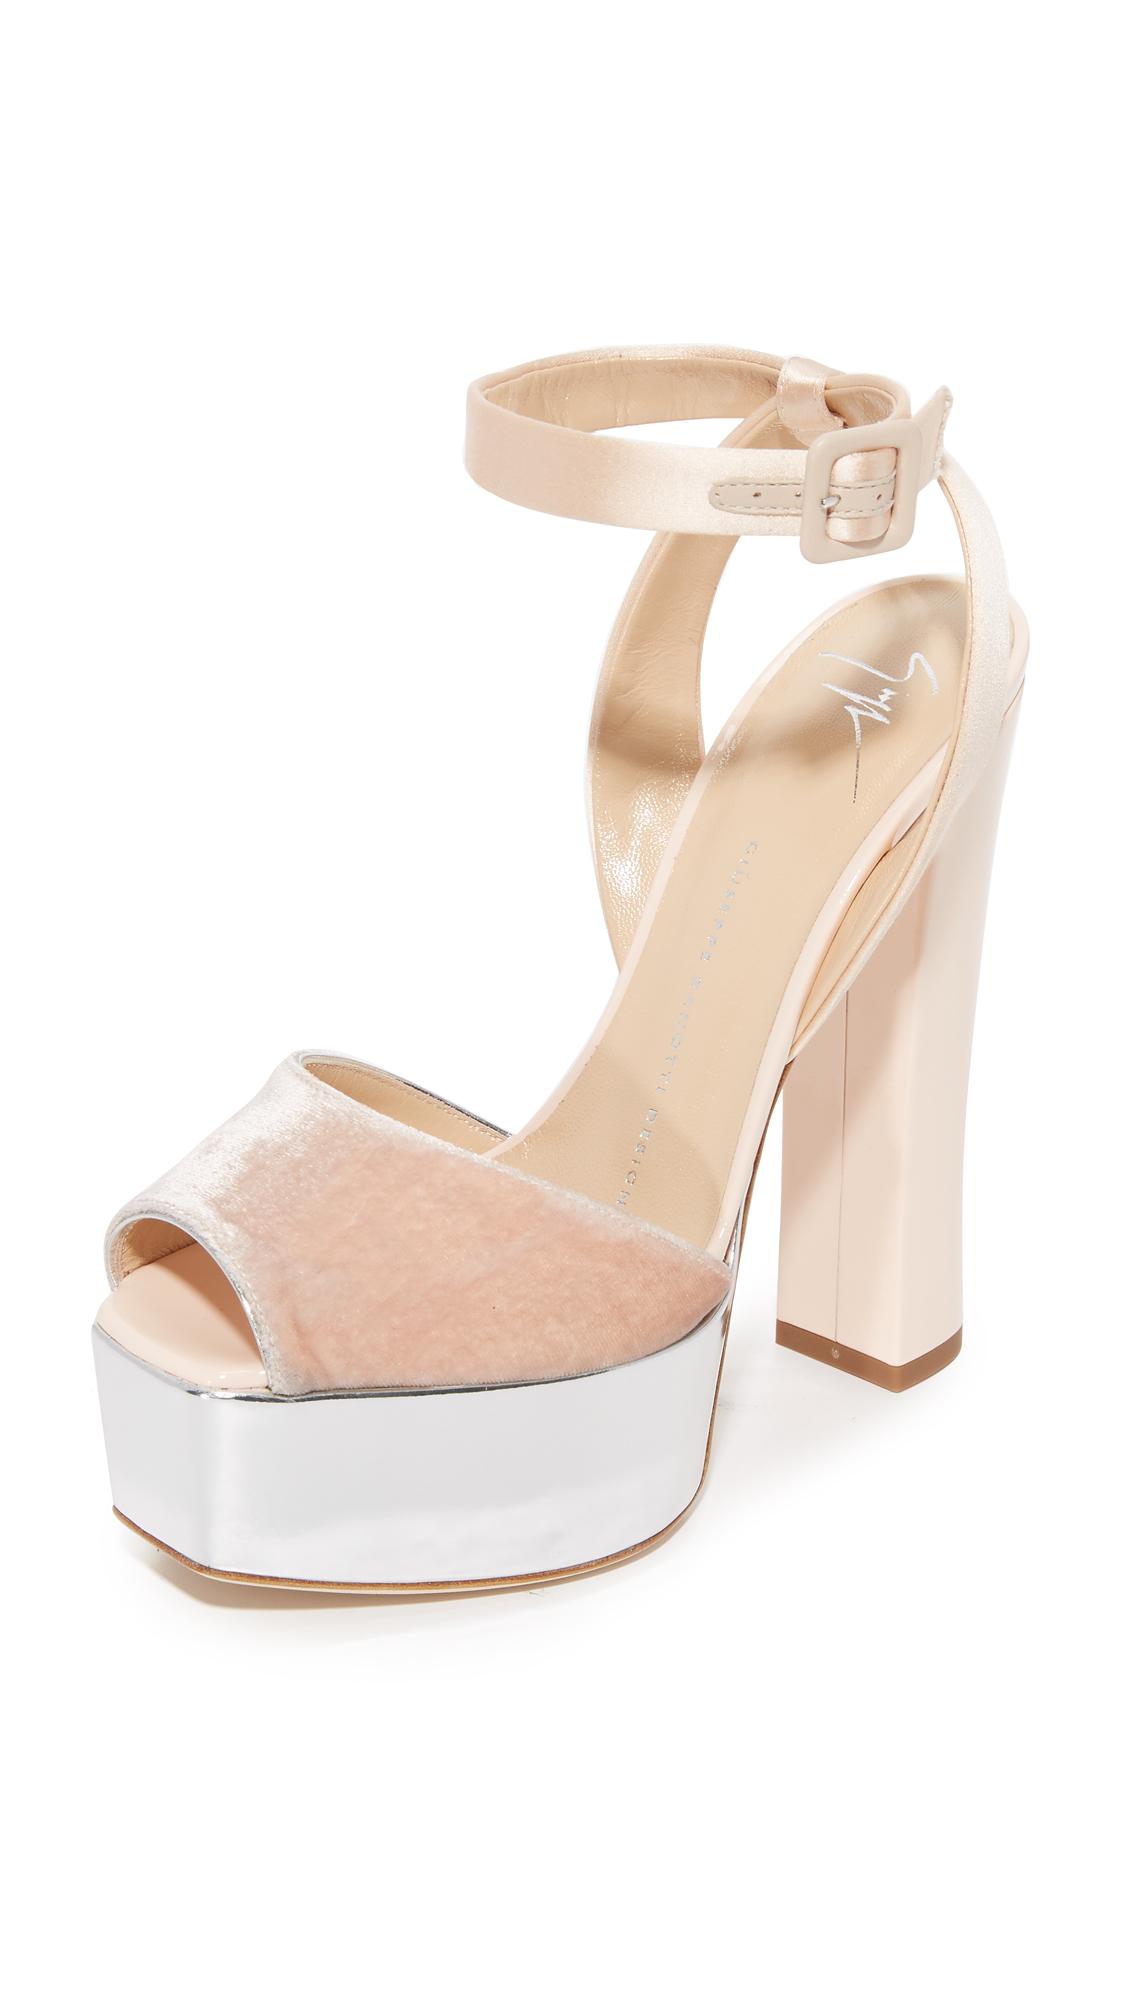 Giuseppe Zanotti Platform Sandals - Cipria at Shopbop